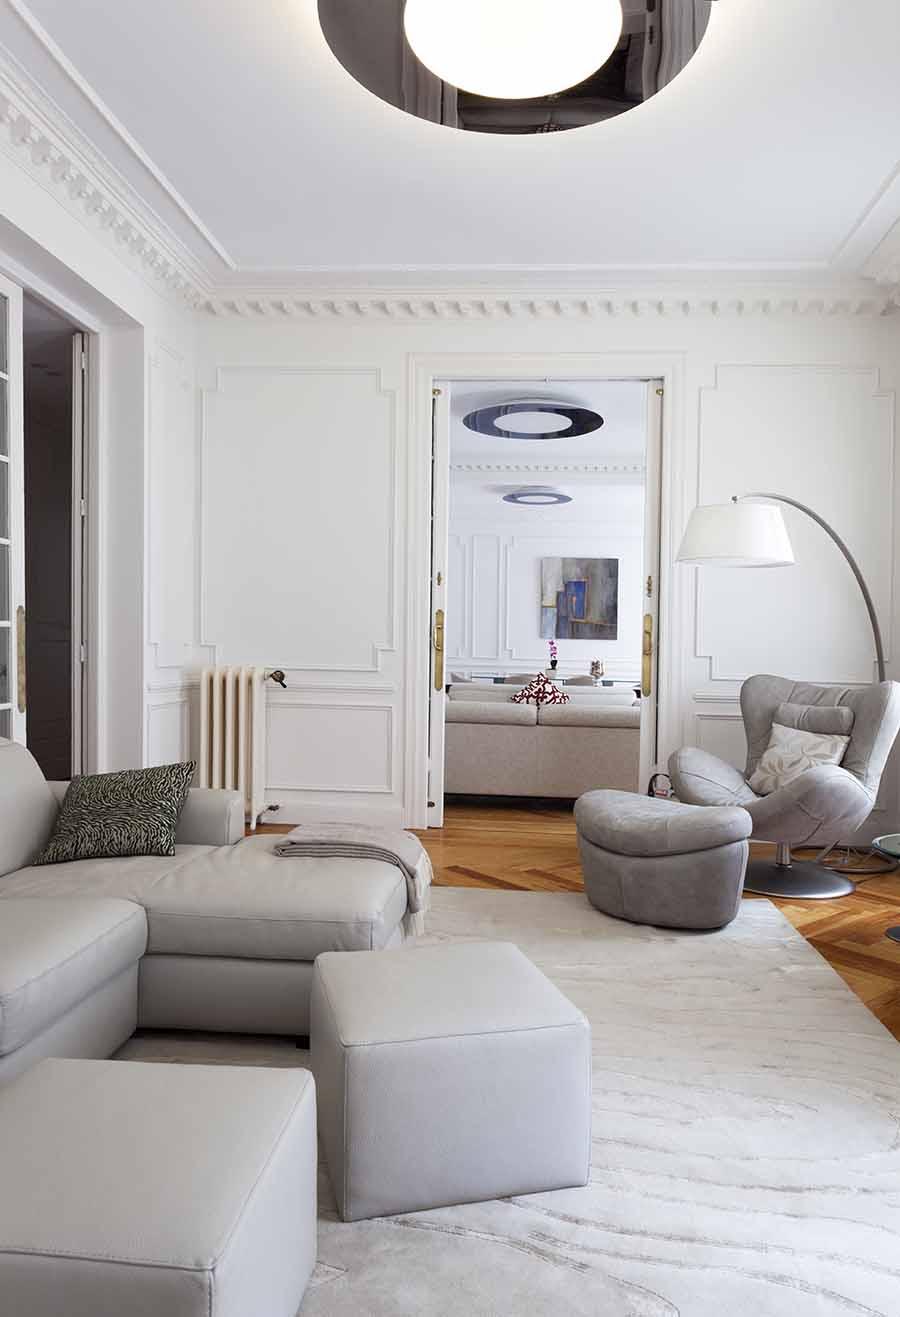 Alfonsoxi23 alicia mesa dise adora de interiores y - Disenadora de interiores ...